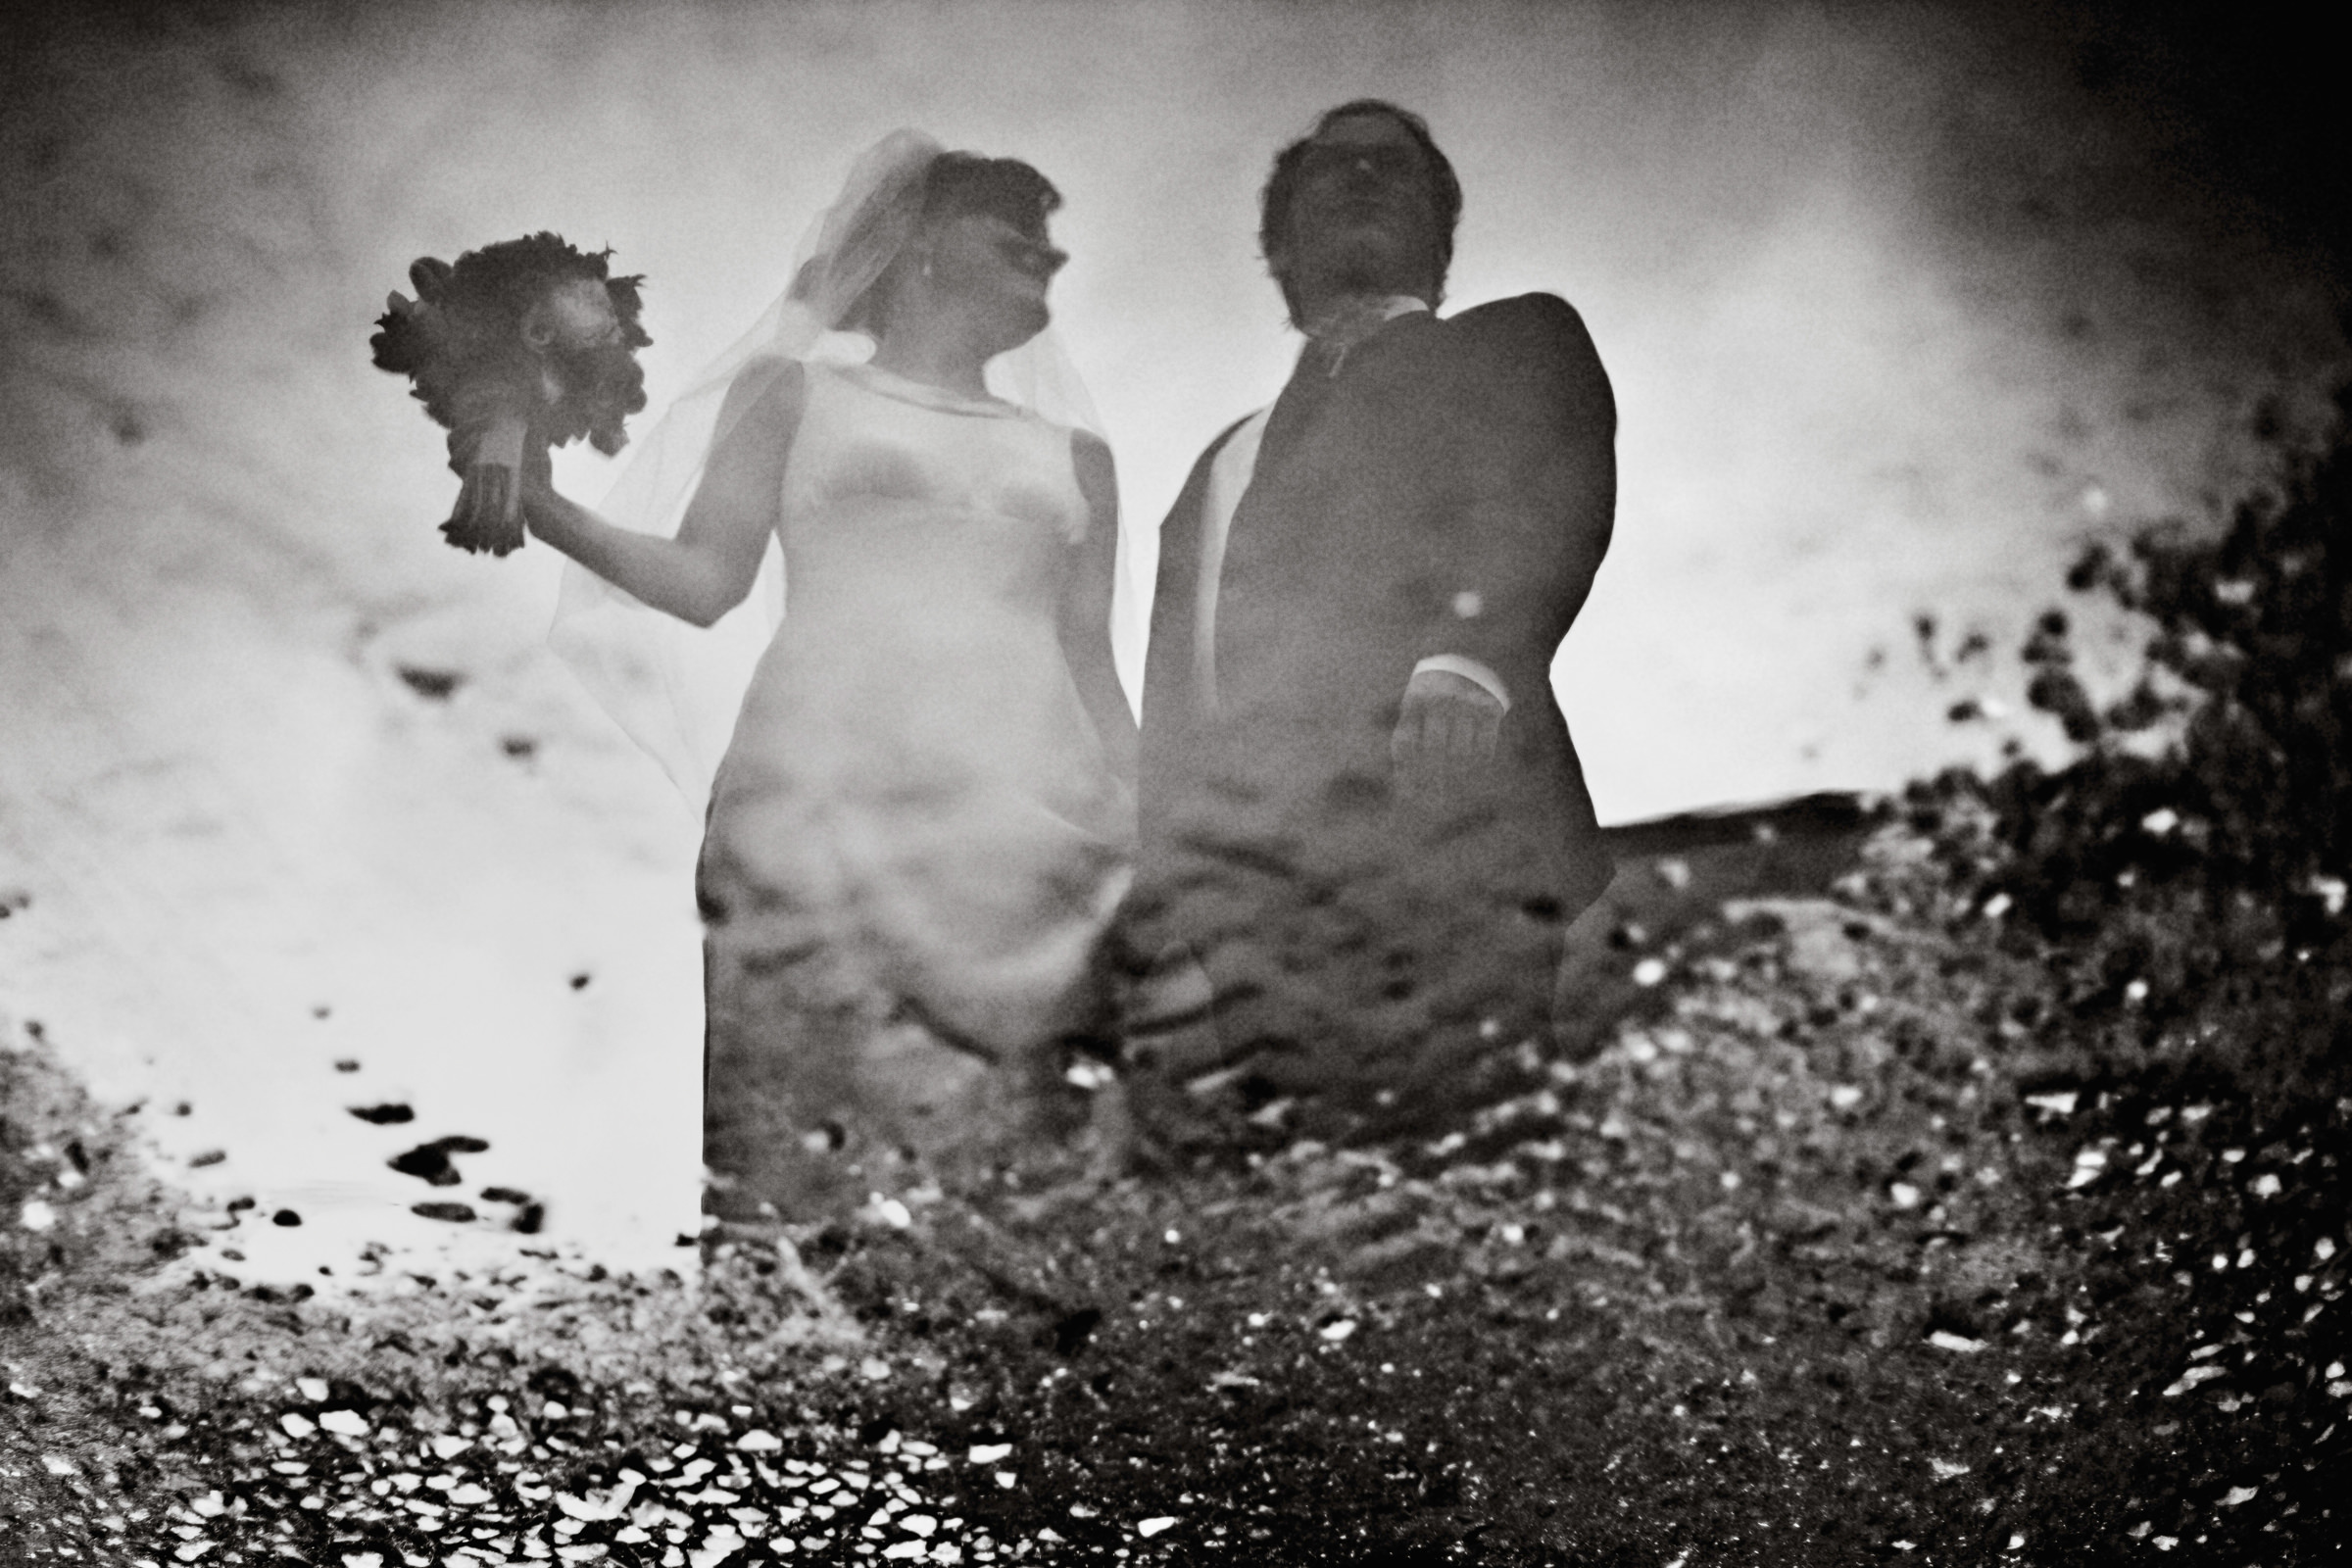 Reflection of couple through surf spray - photo by Jonas Seaman Photography